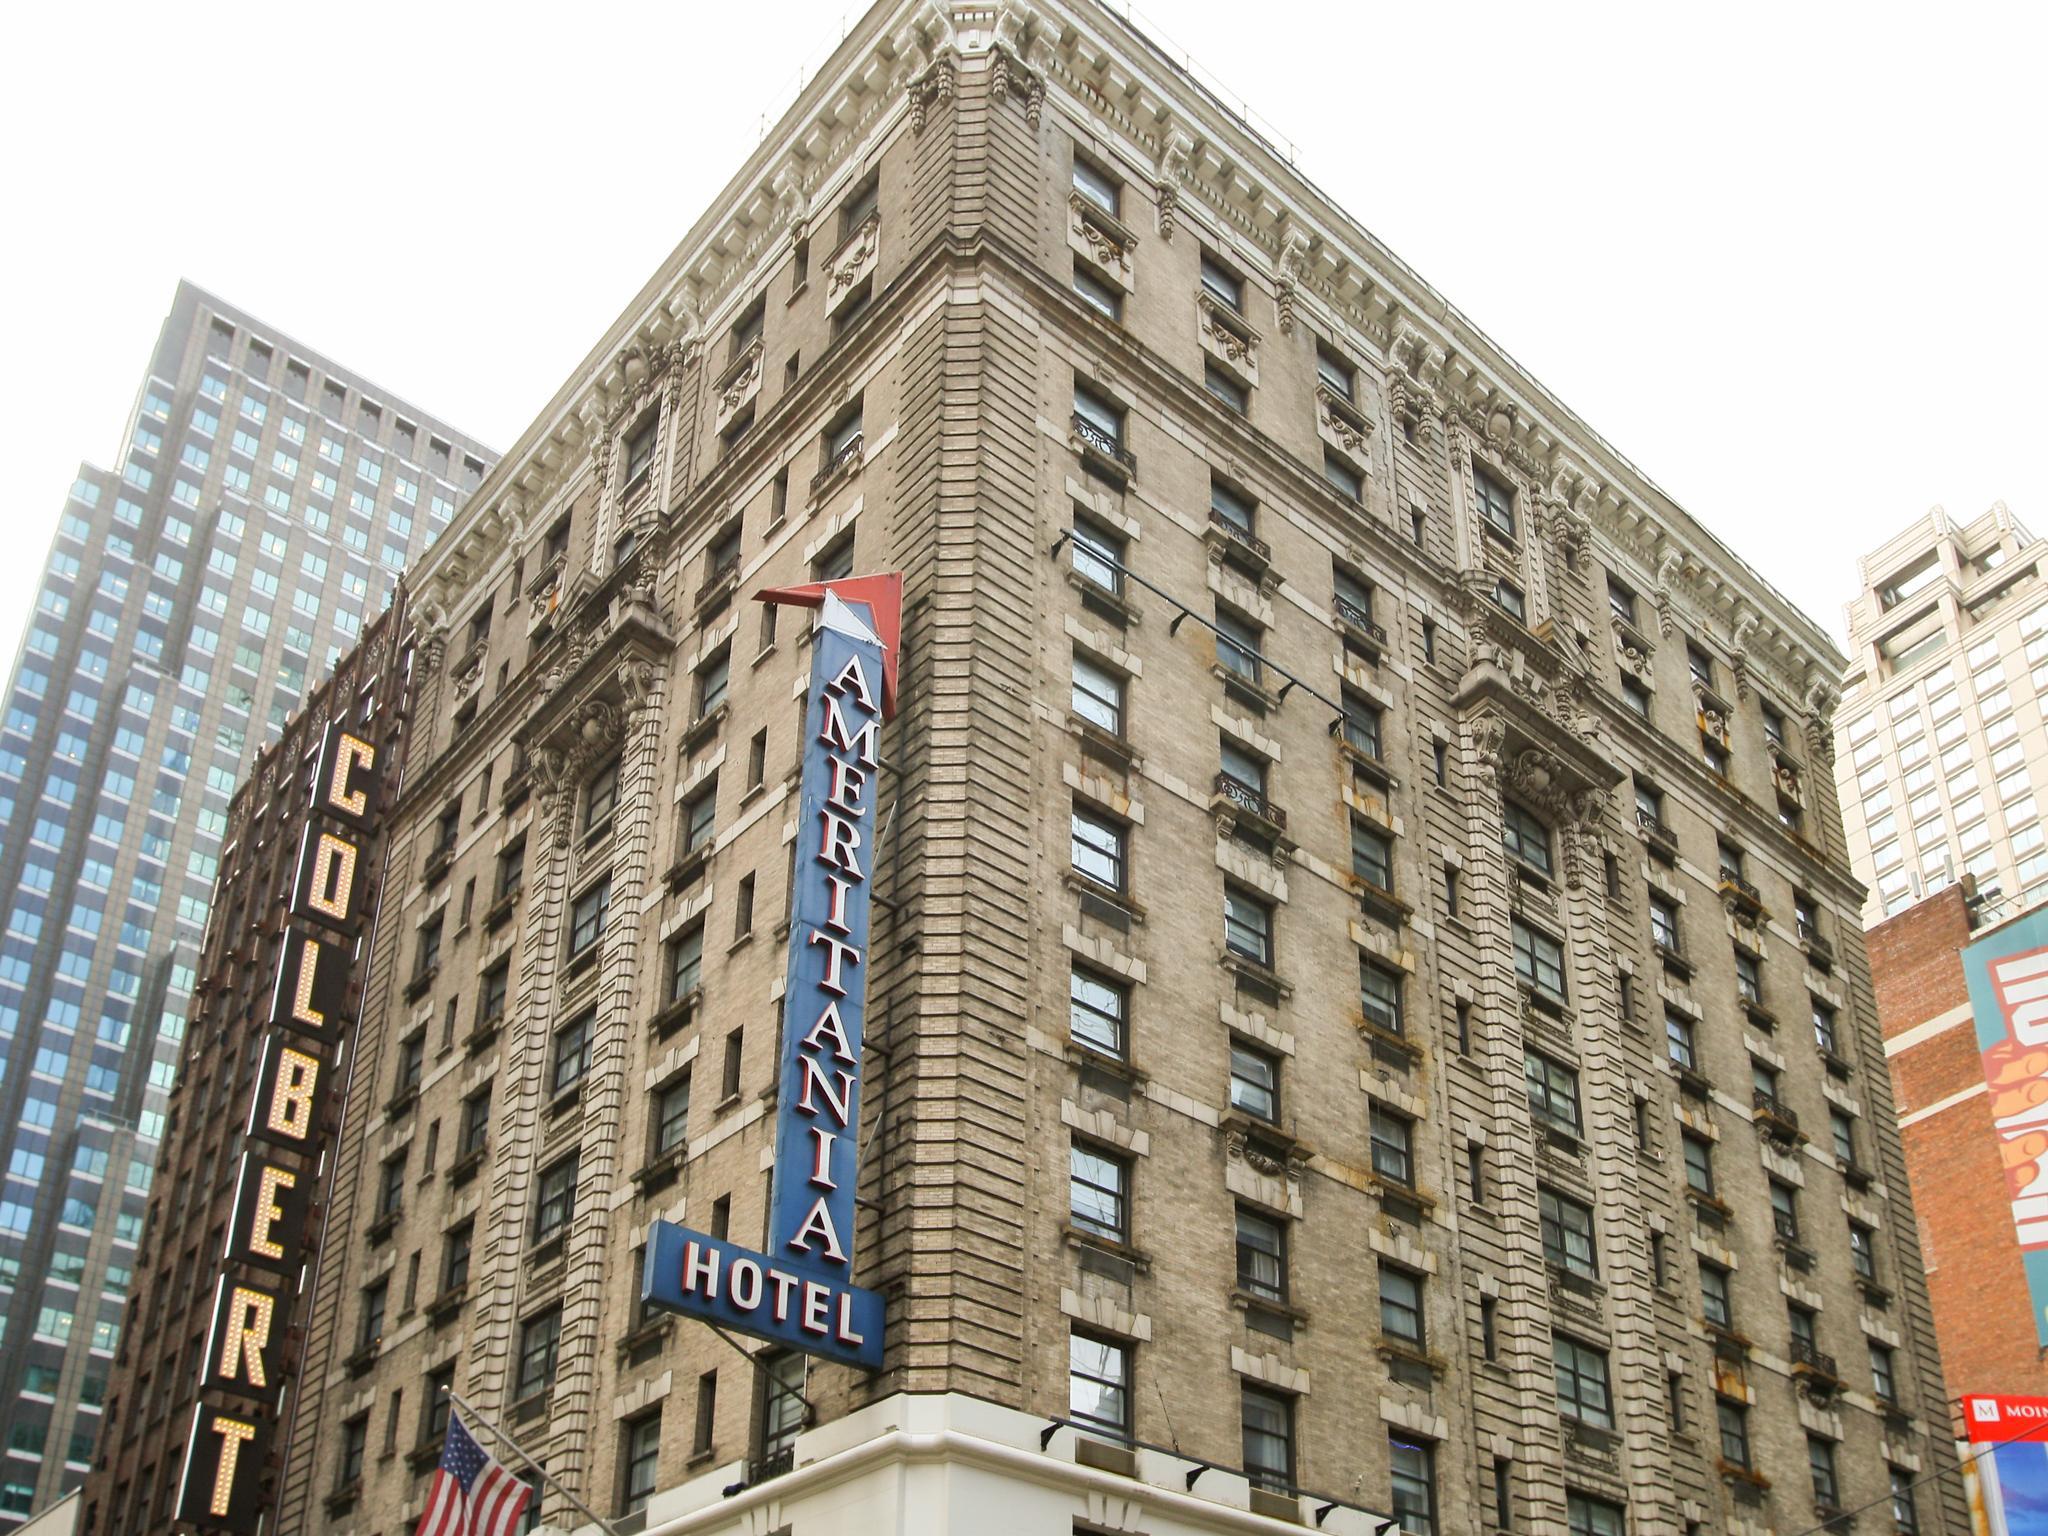 Ameritania Hotel at Times Square image